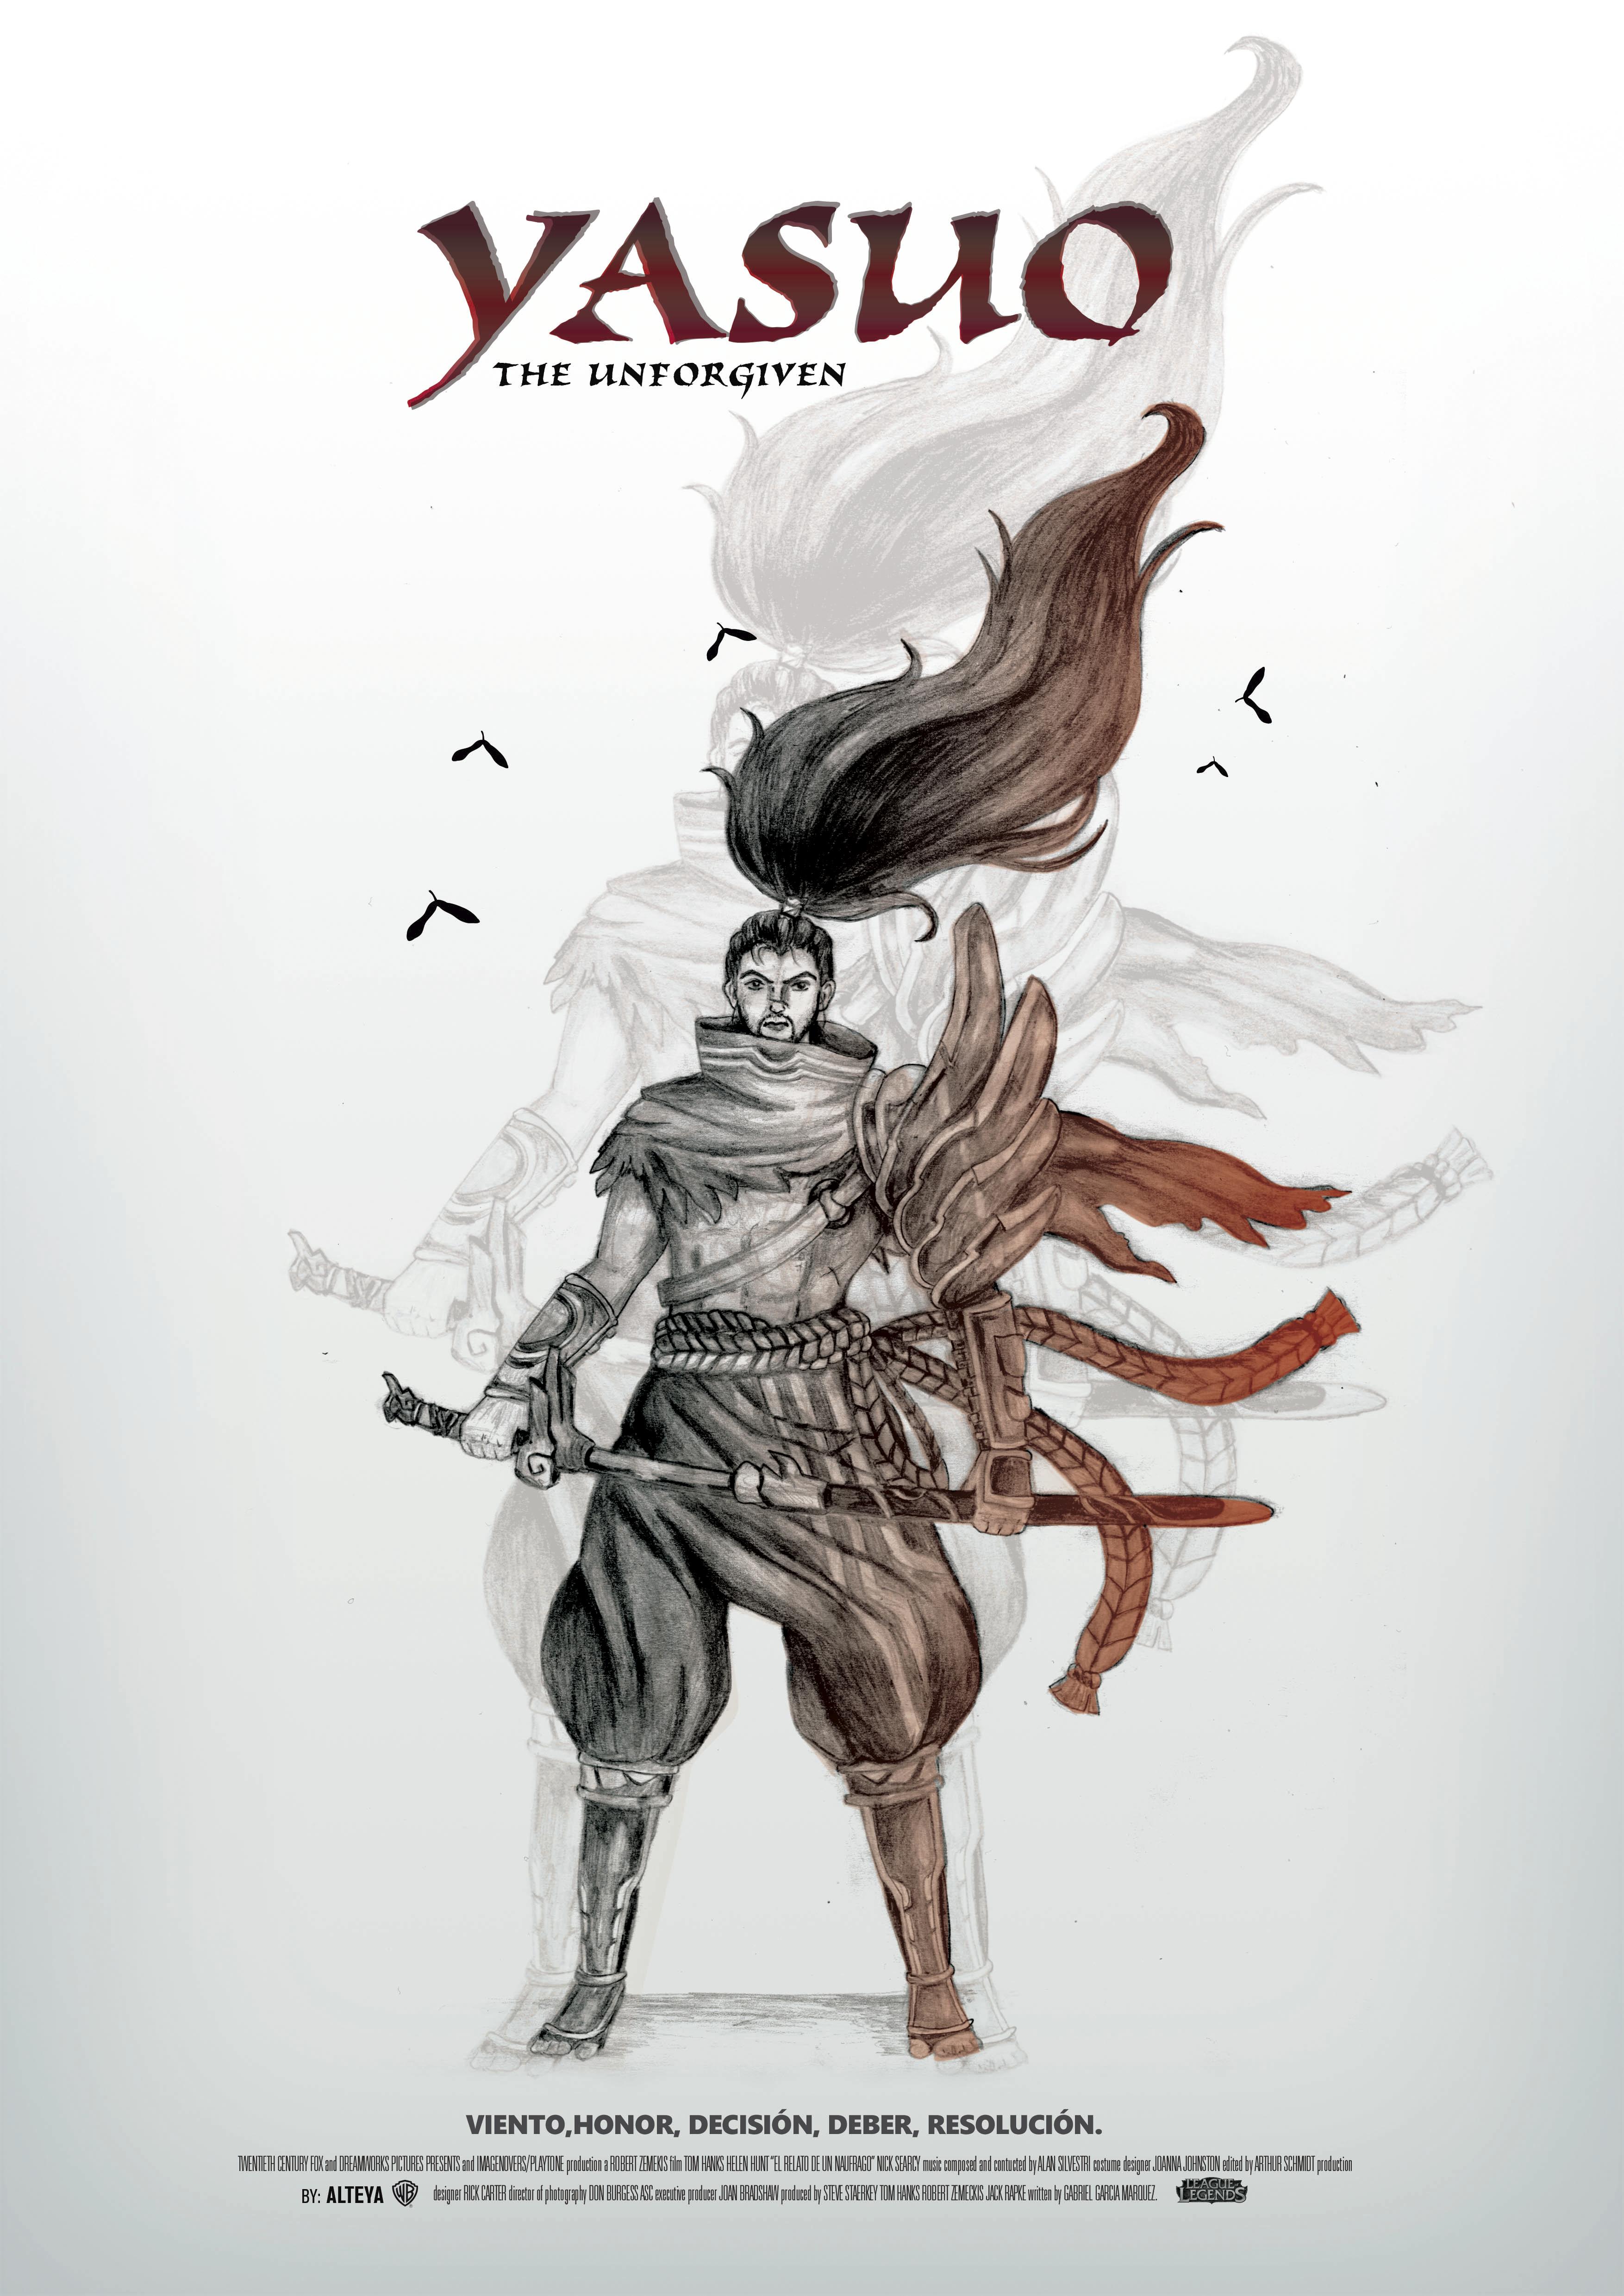 Alteya_Yasuo-the-unforgiven_contest